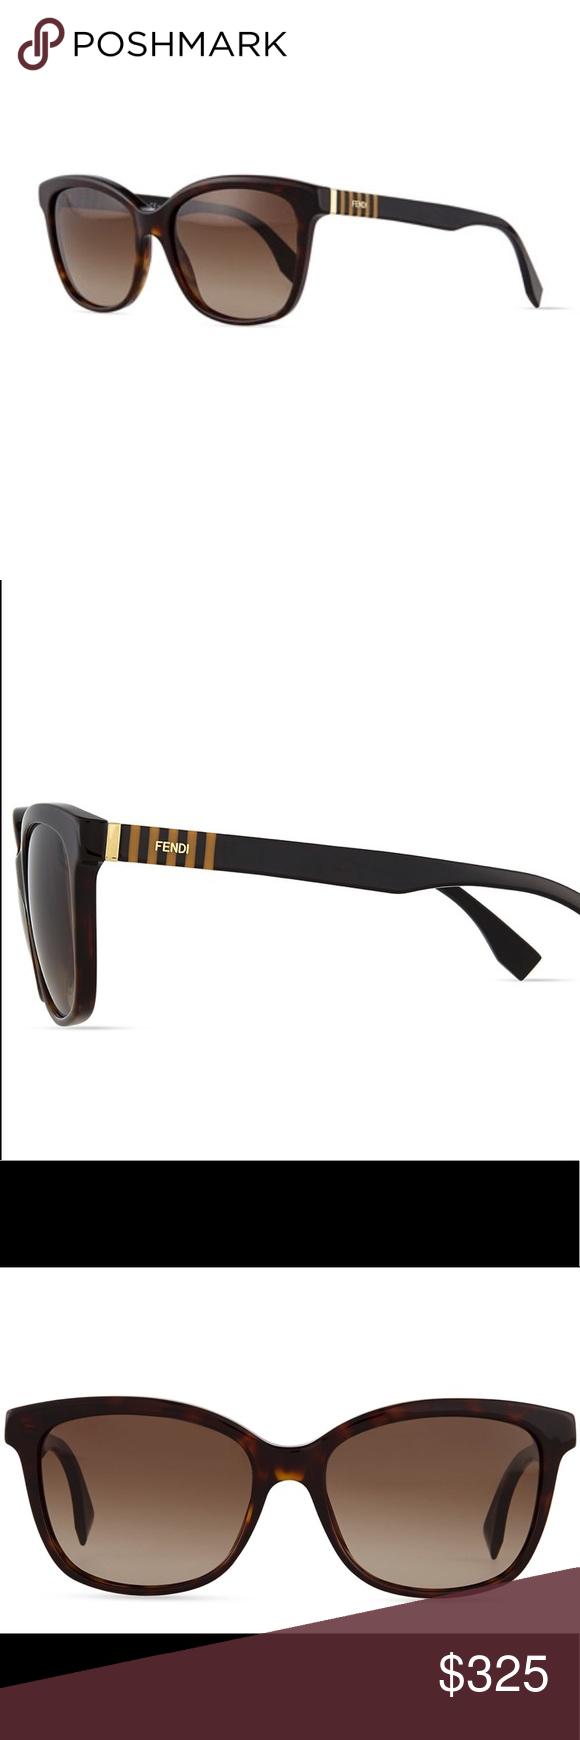 635545fa420 🆕 Fendi Pequin Striped-Temple Sunglasses Authentic Fendi Pequin ...